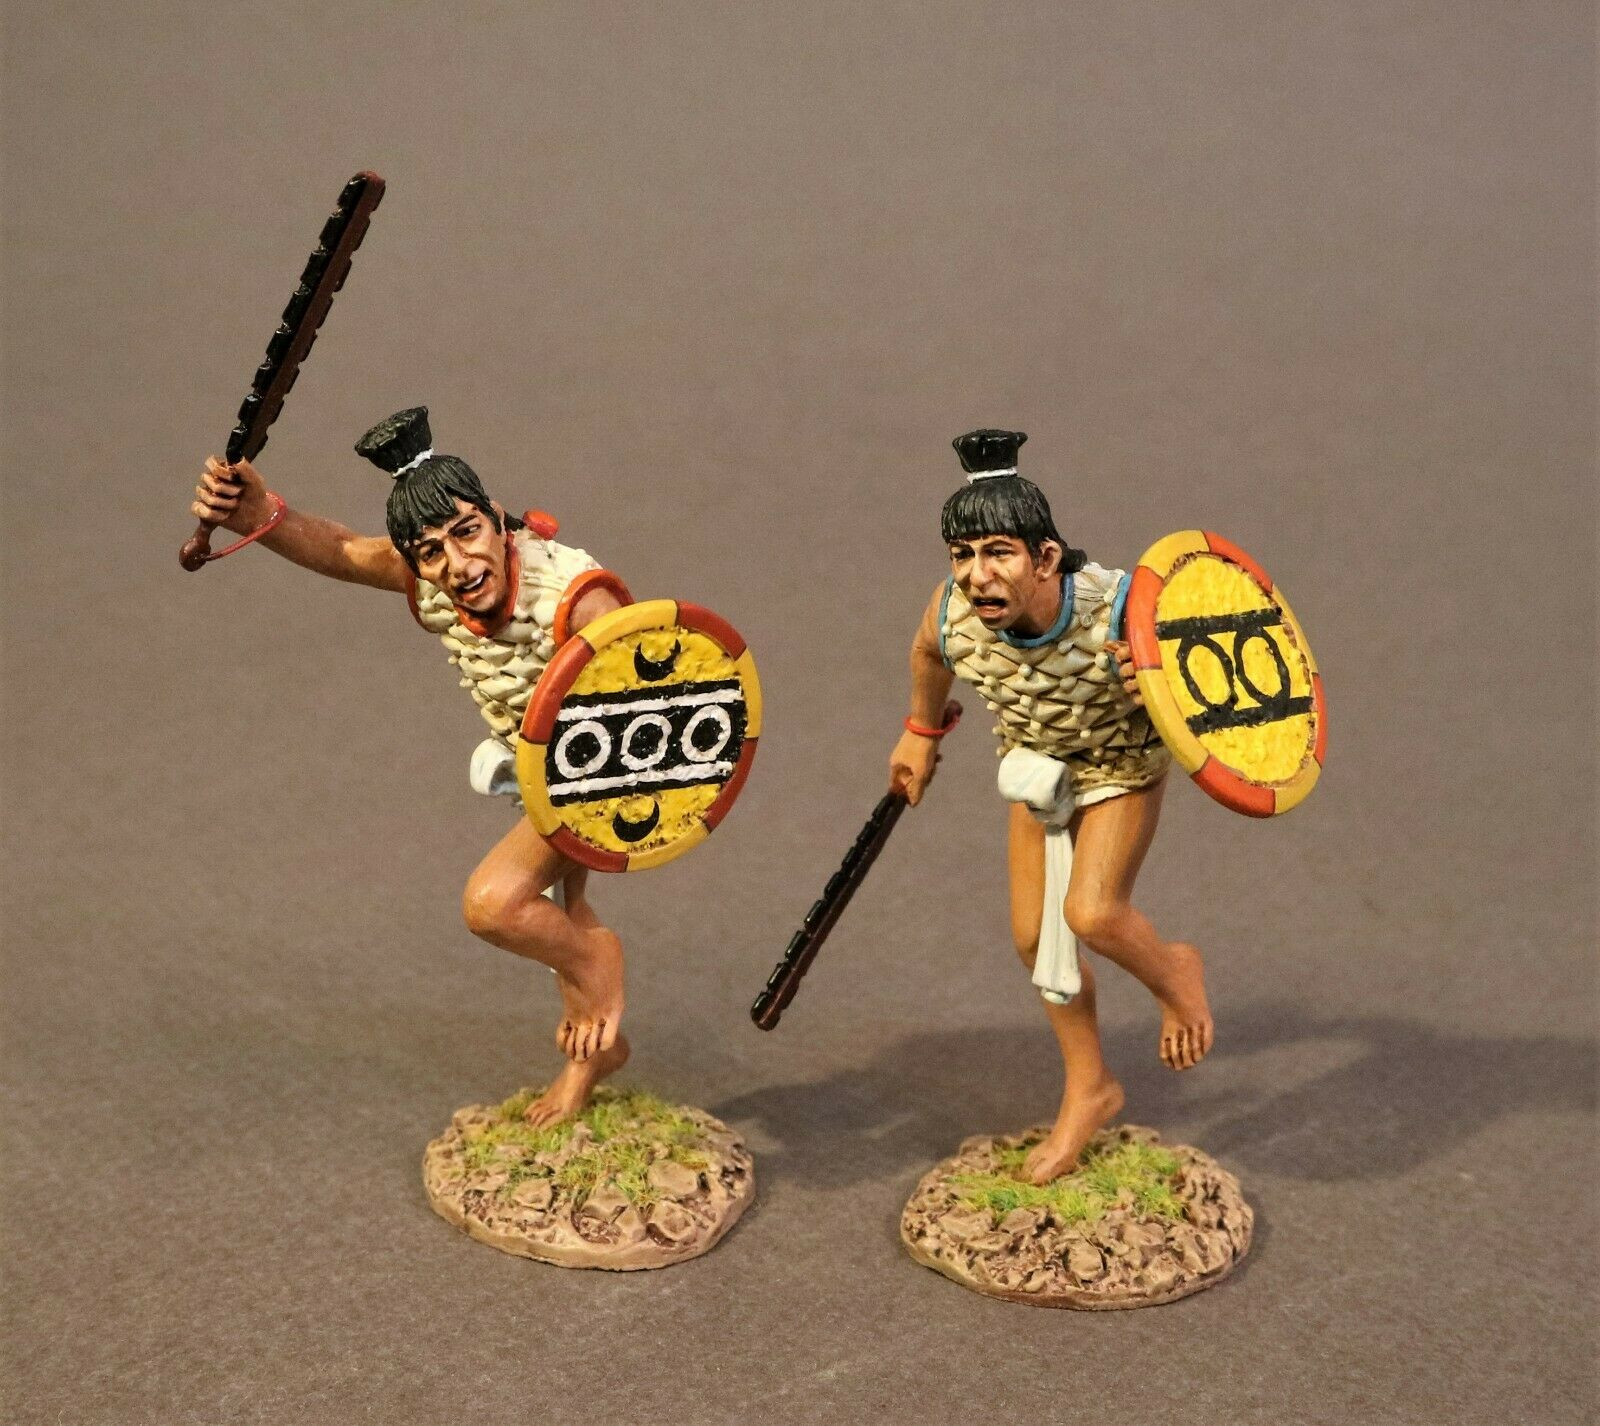 John Jenkins Azteken & Conquistadors AZ-36 Azteken Krieger MIB